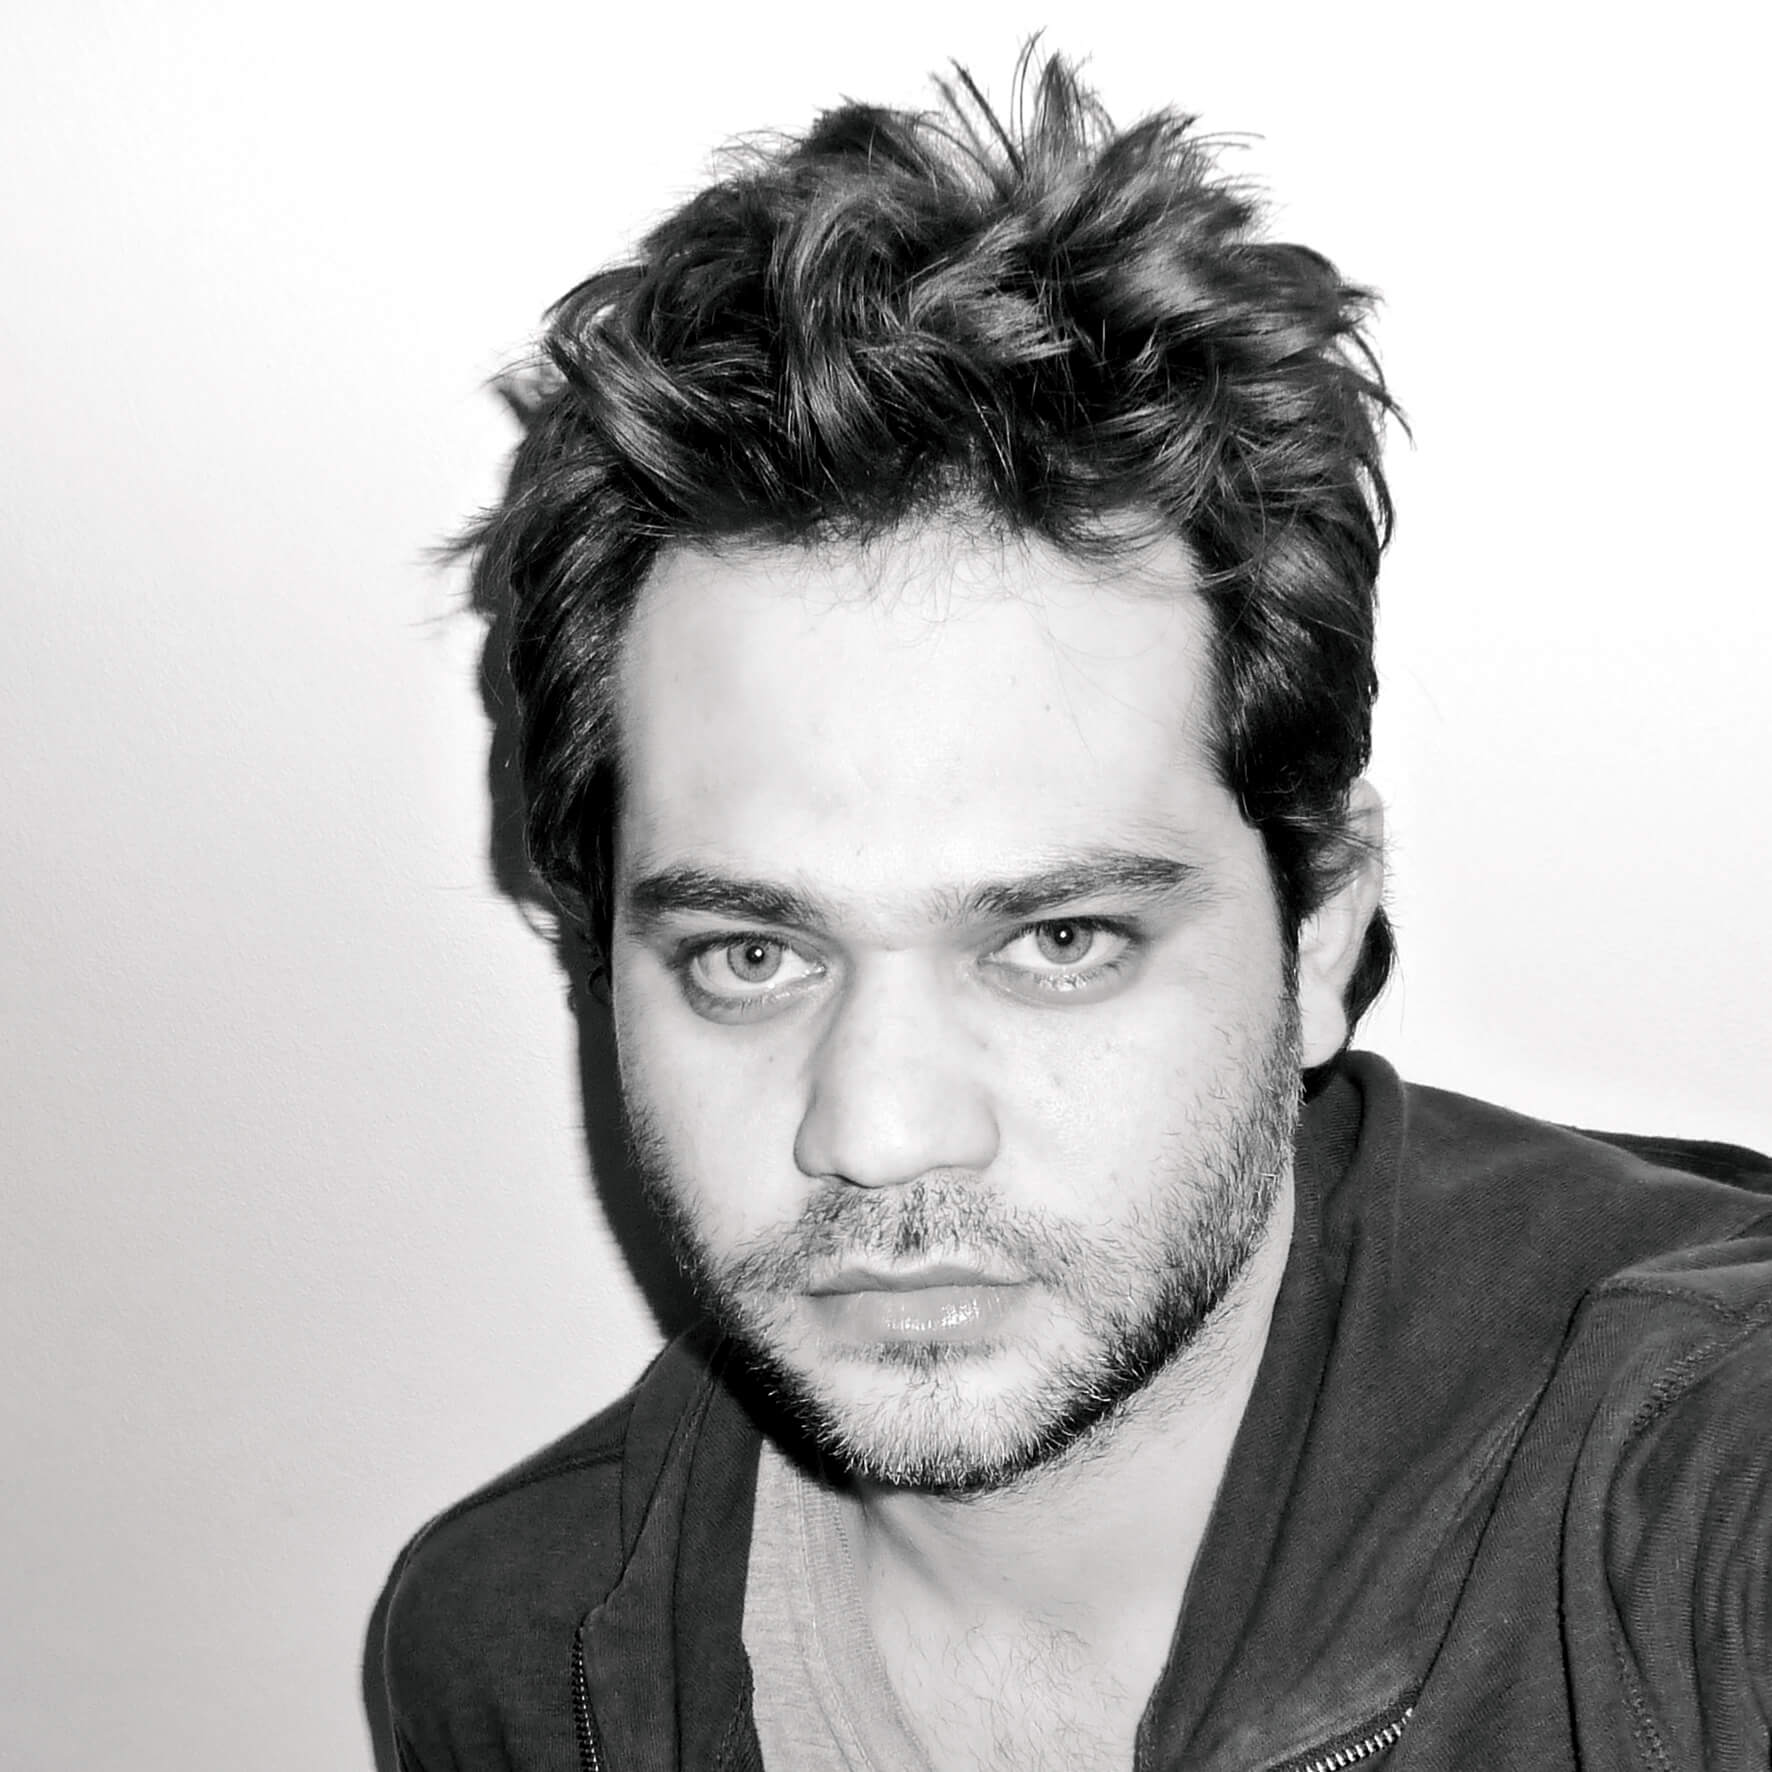 Nicholas Lambouris